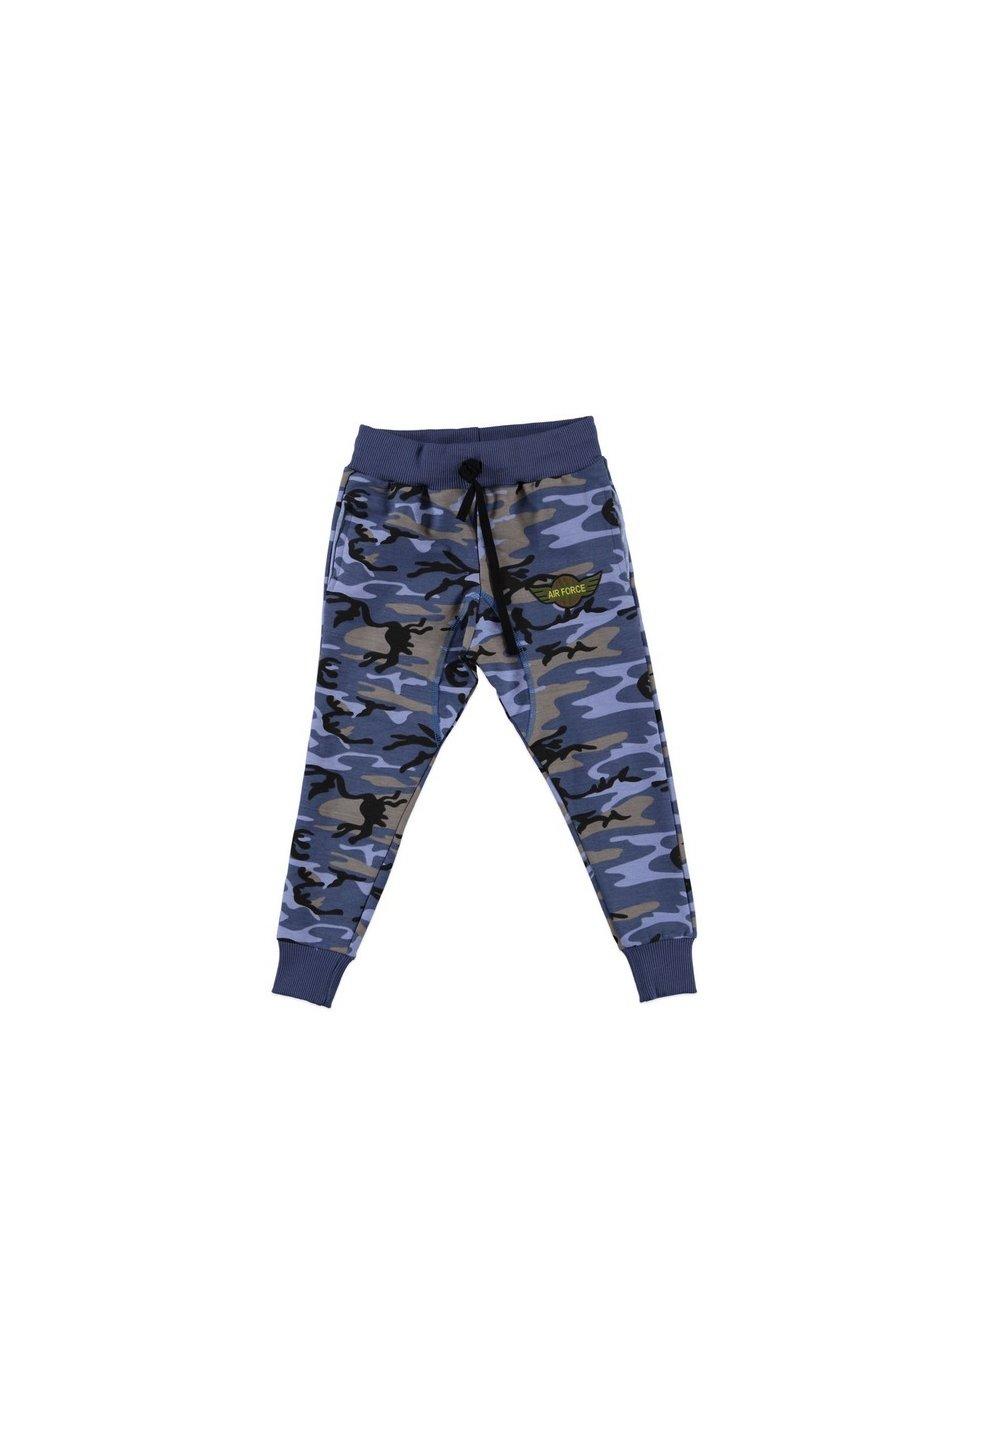 Pantaloni de trening, Air force, albastri